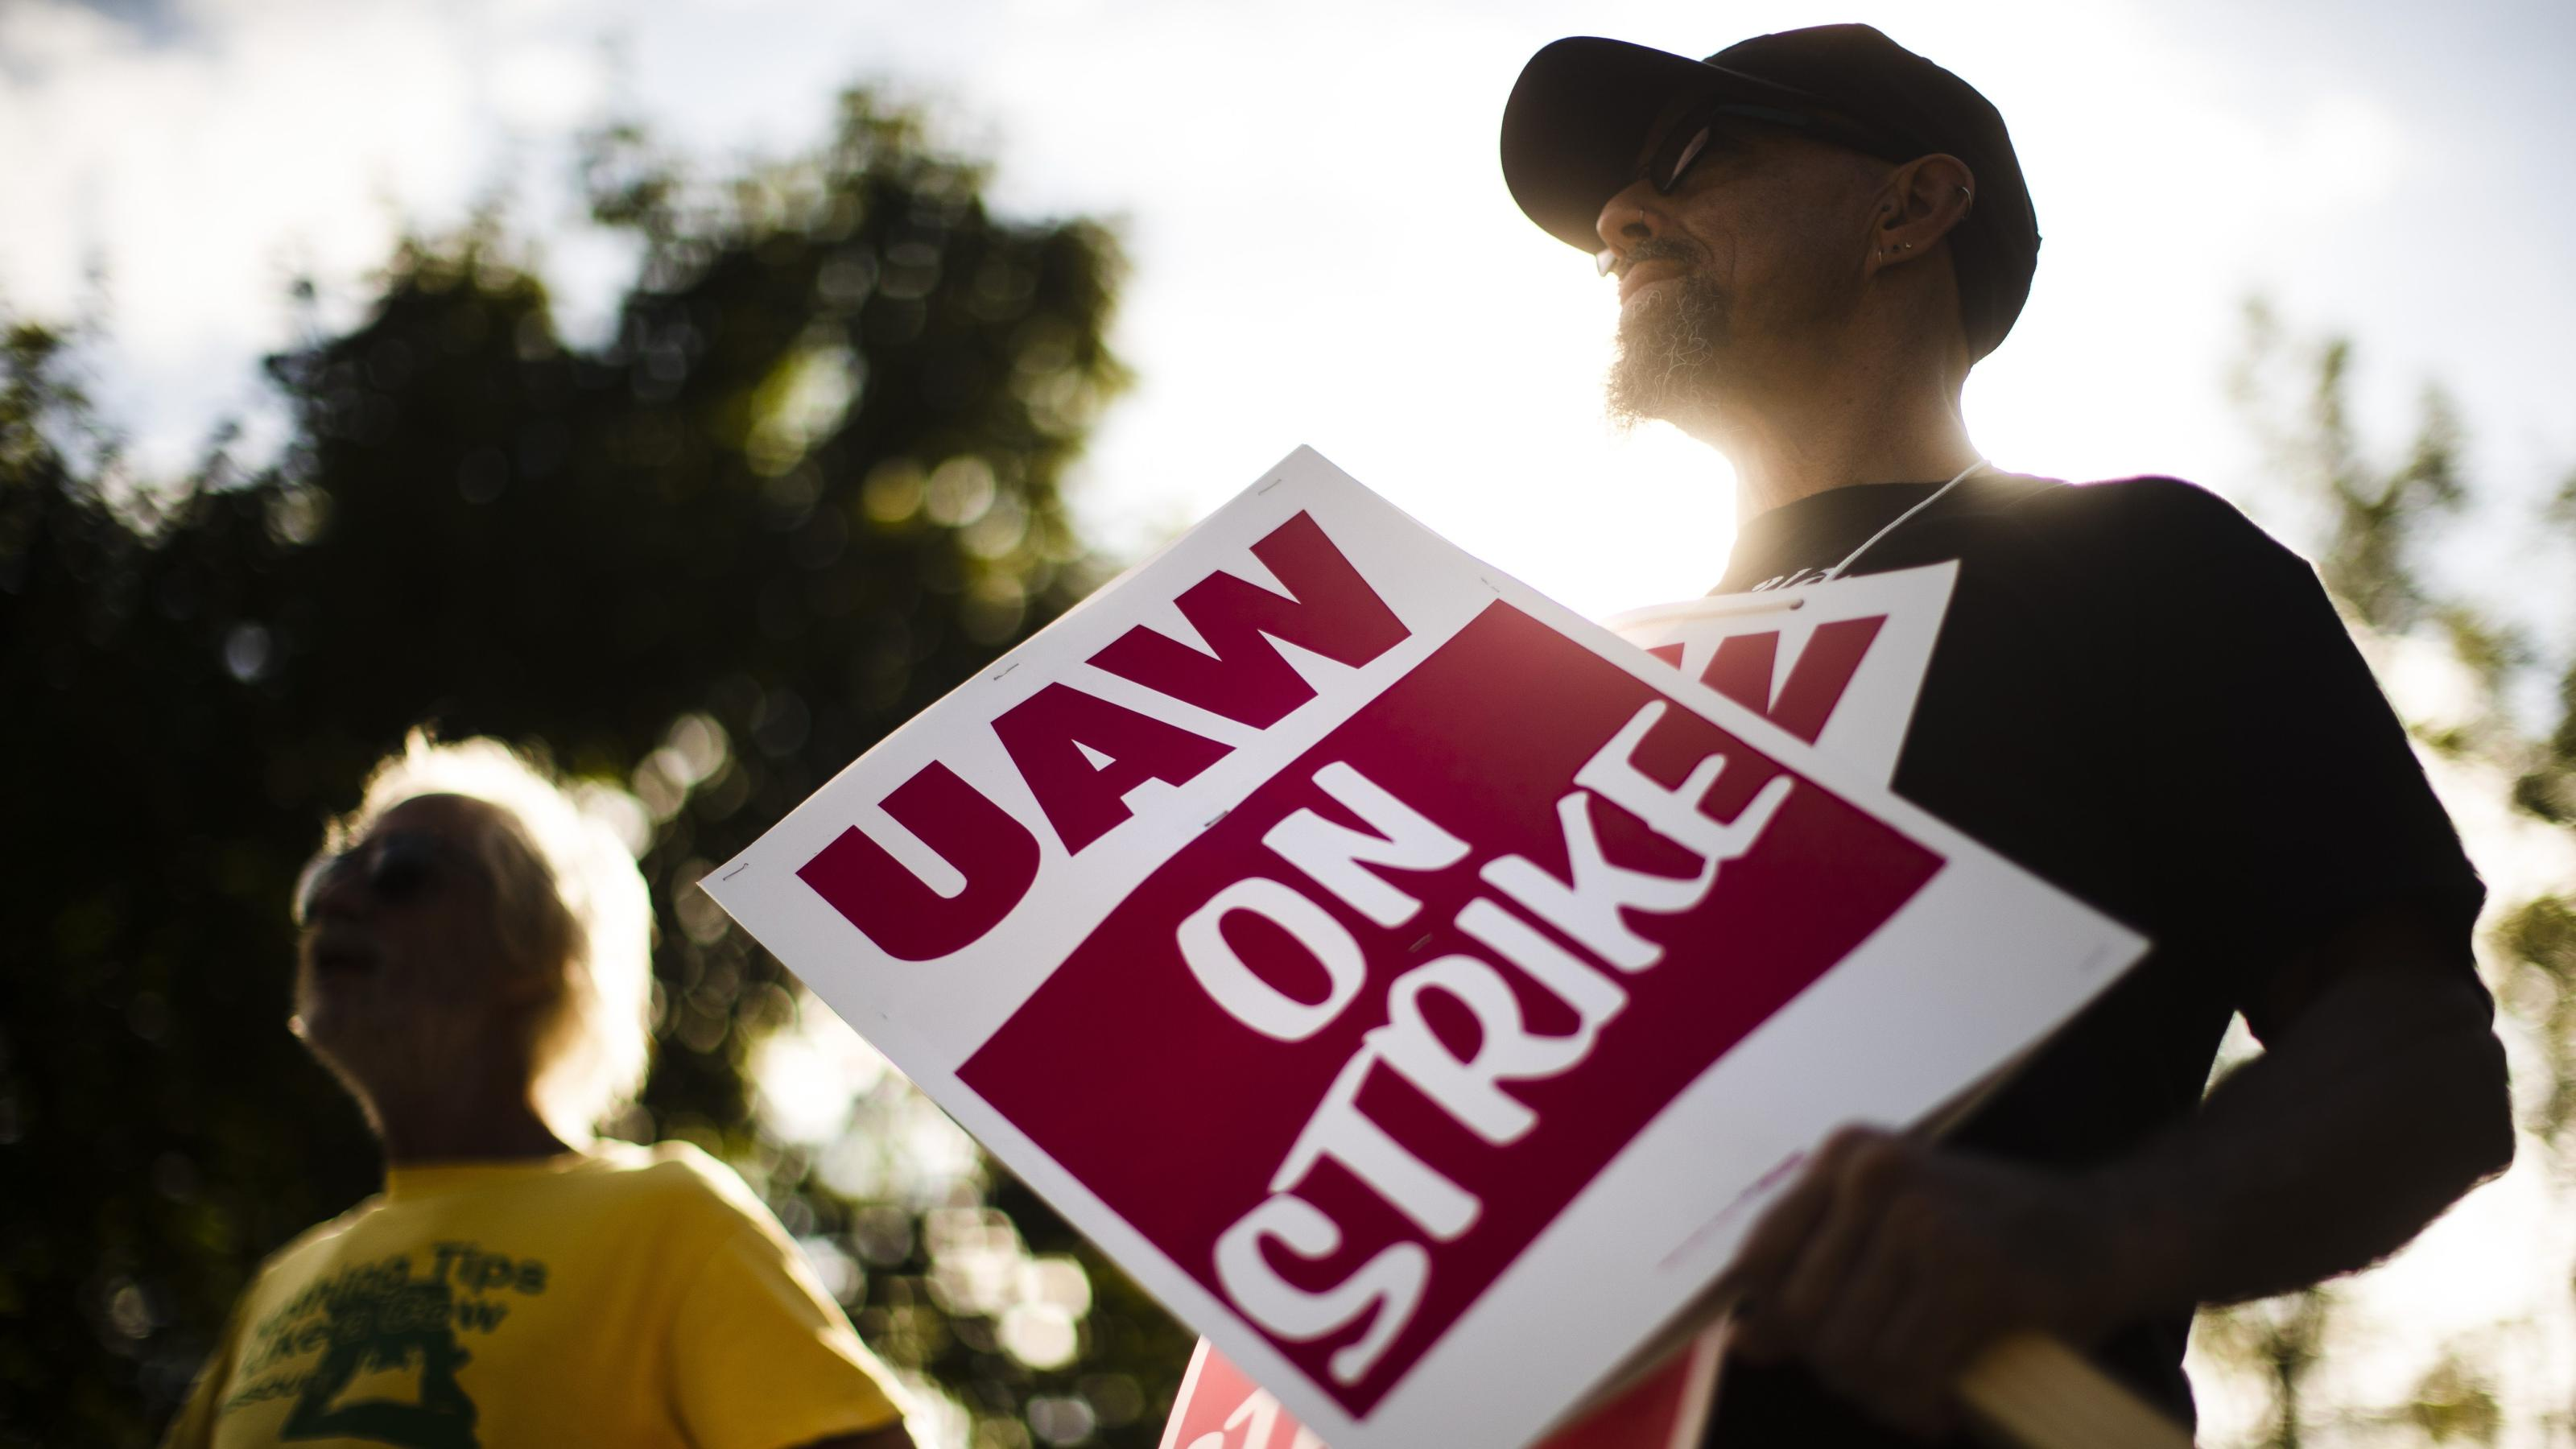 GM strike: UAW pickets as public opinion of unions runs high